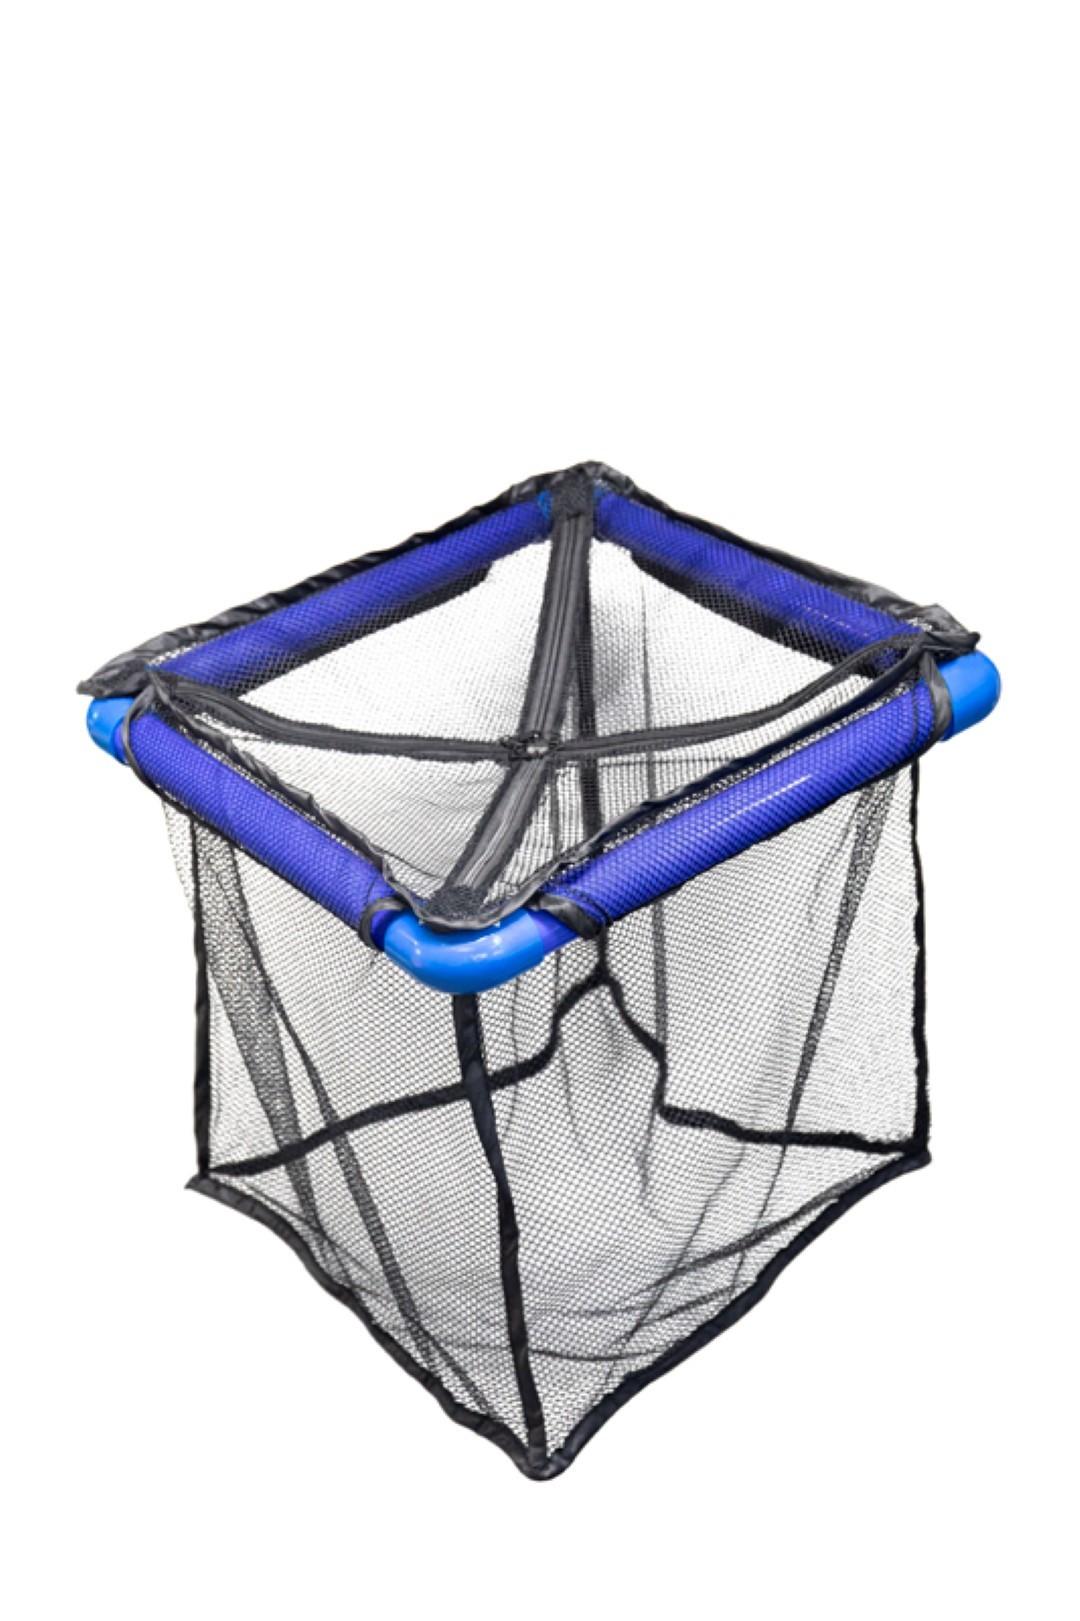 Kp Floating Fish Cage 70X70X70 Cm vijver